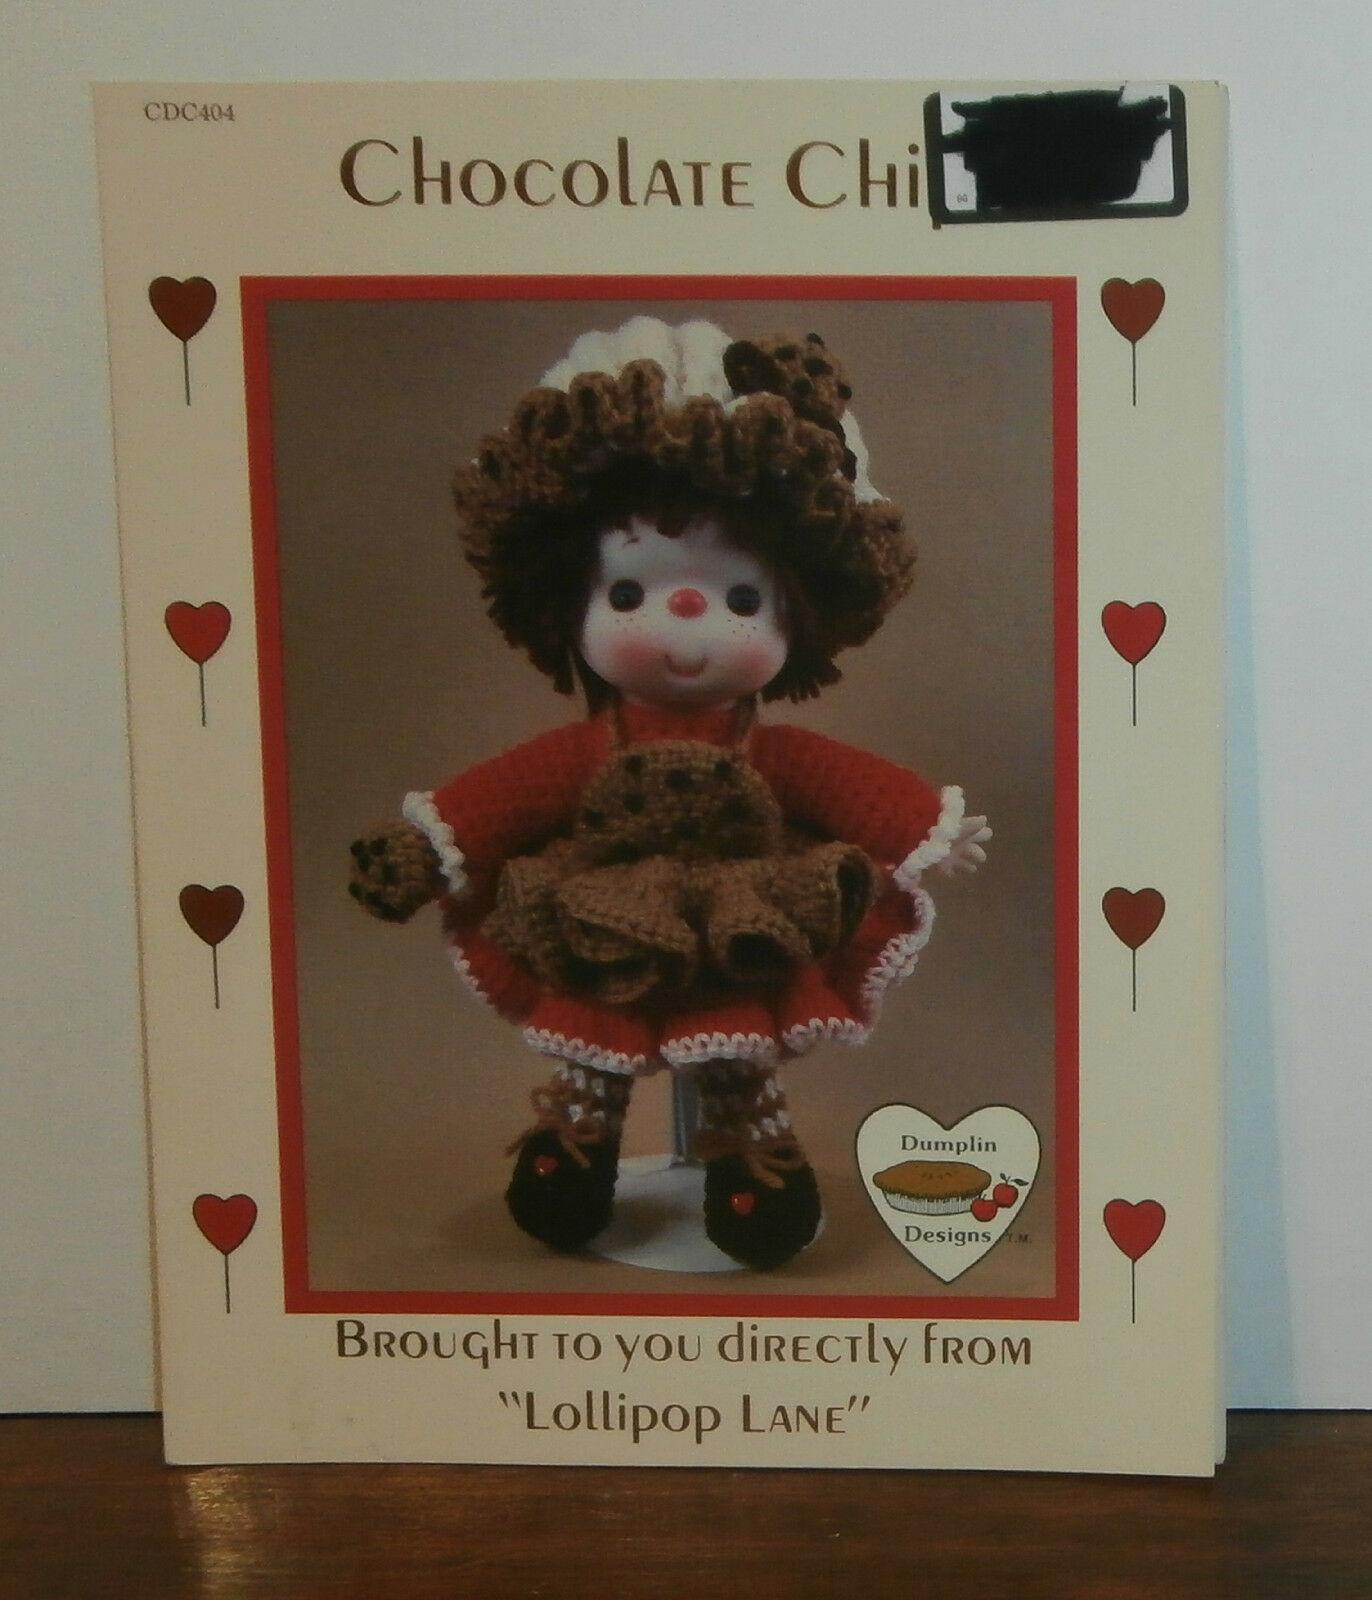 Chocolate Chip Doll Lollipop Lane Dumplin Designs Crochet Pattern Leaflet - $6.89